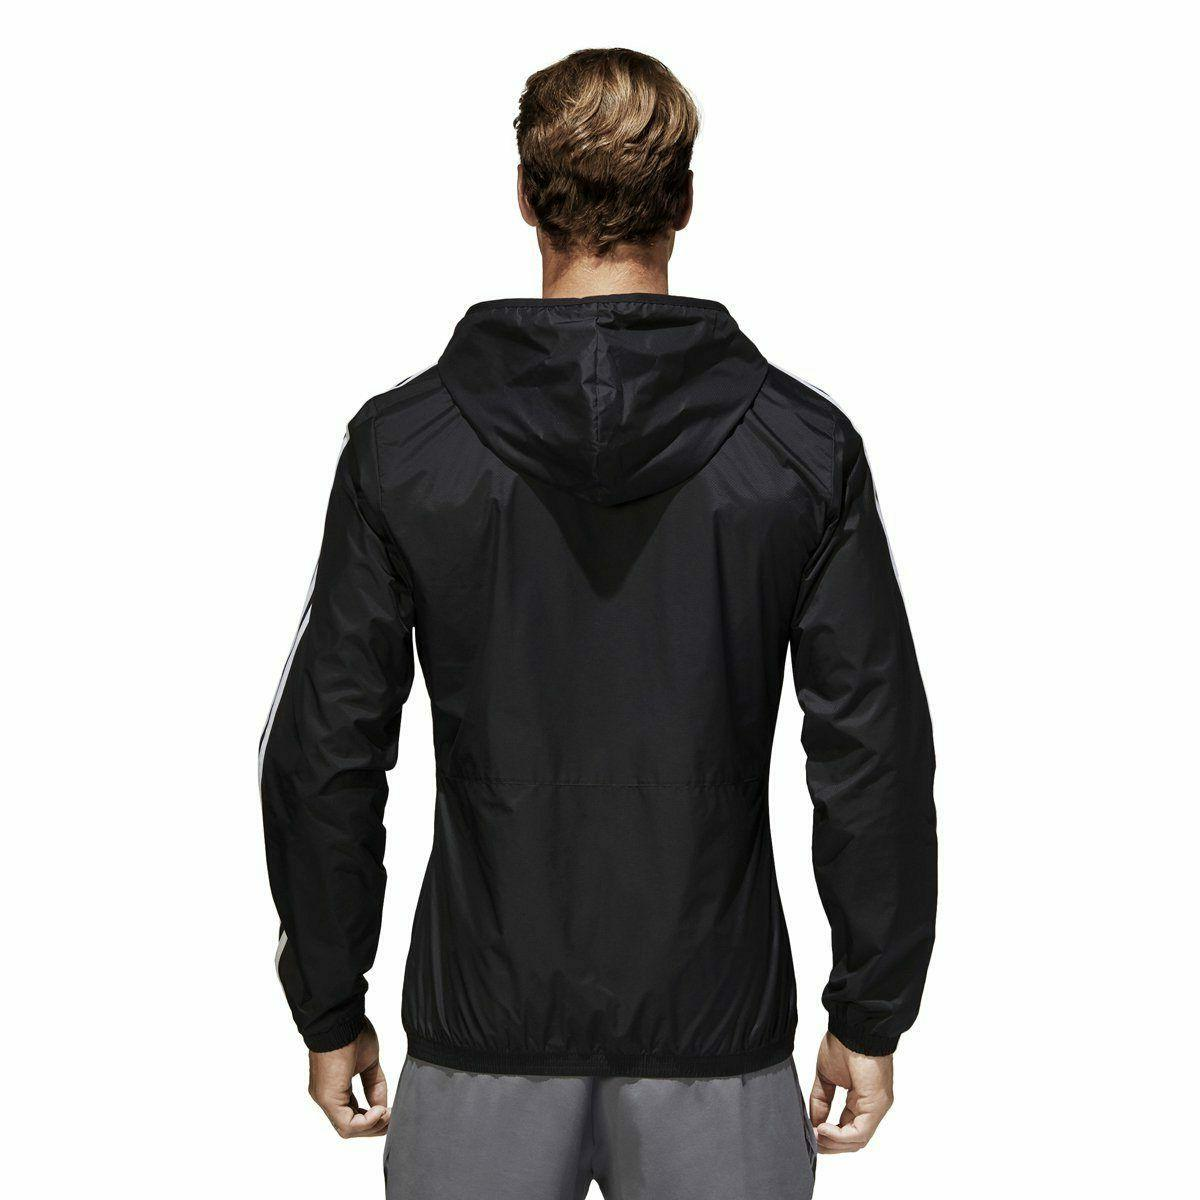 Wind Jacket Black / White BS2232